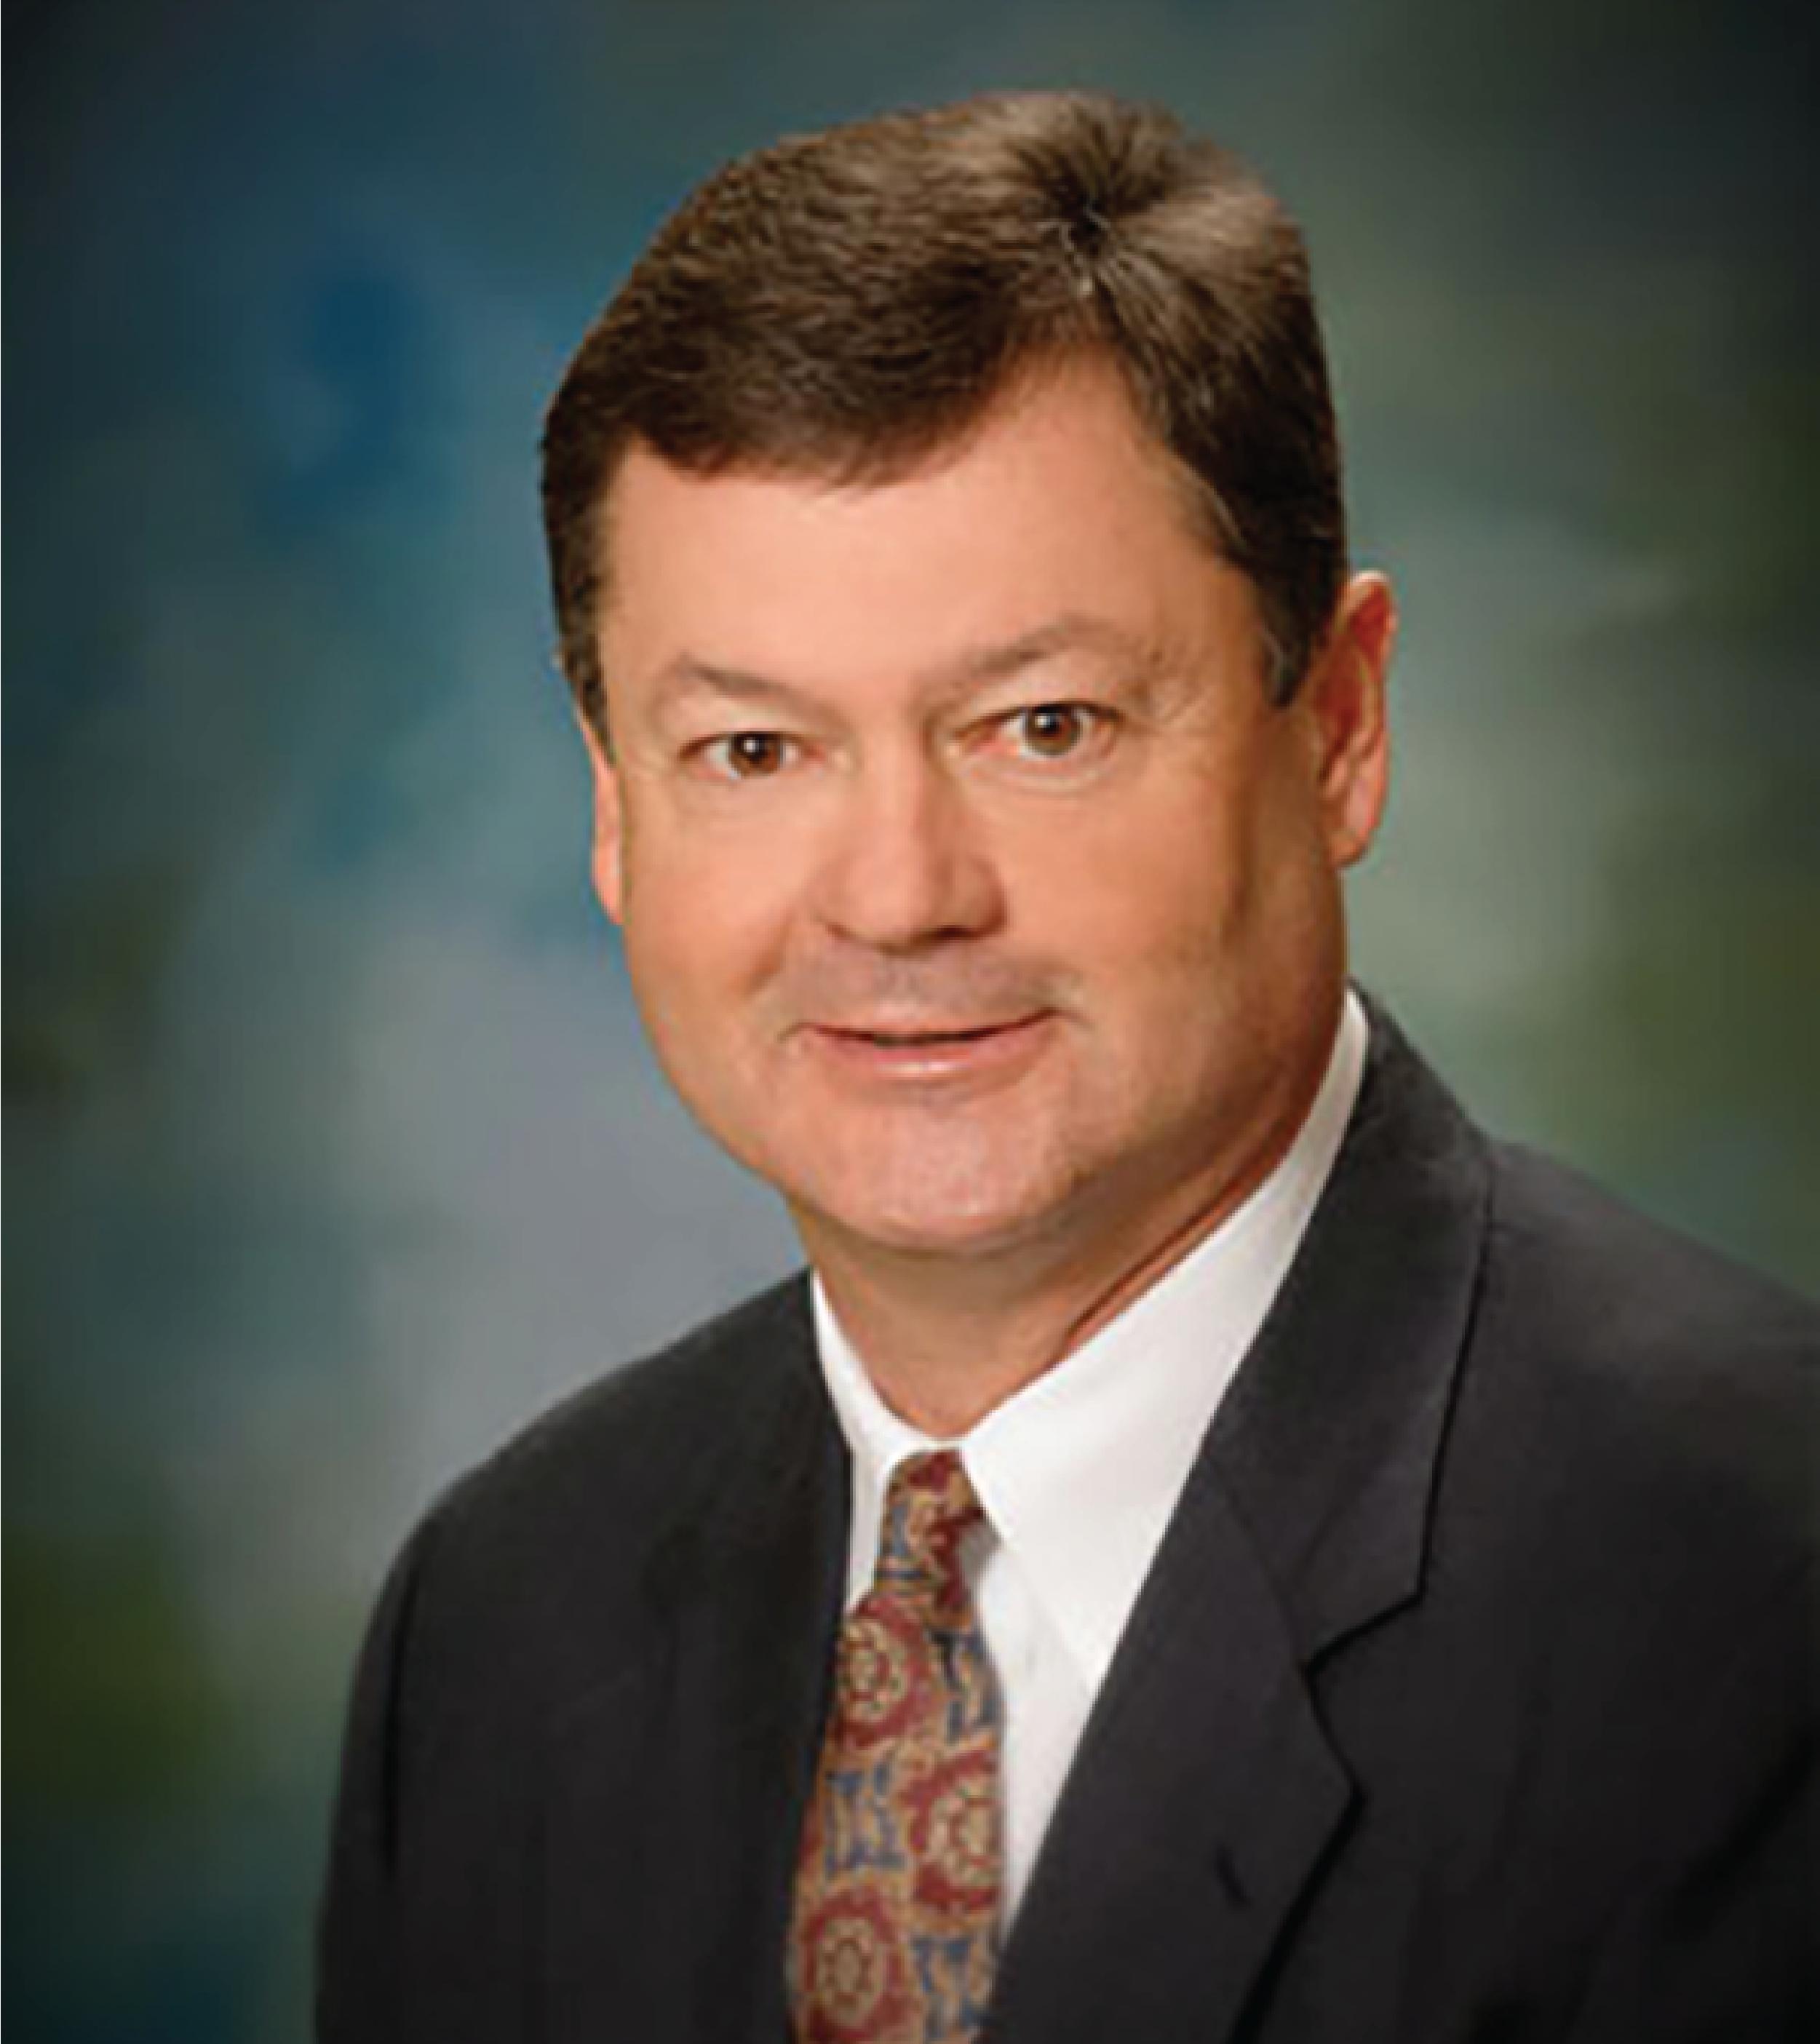 Portrait of Steve Haraway